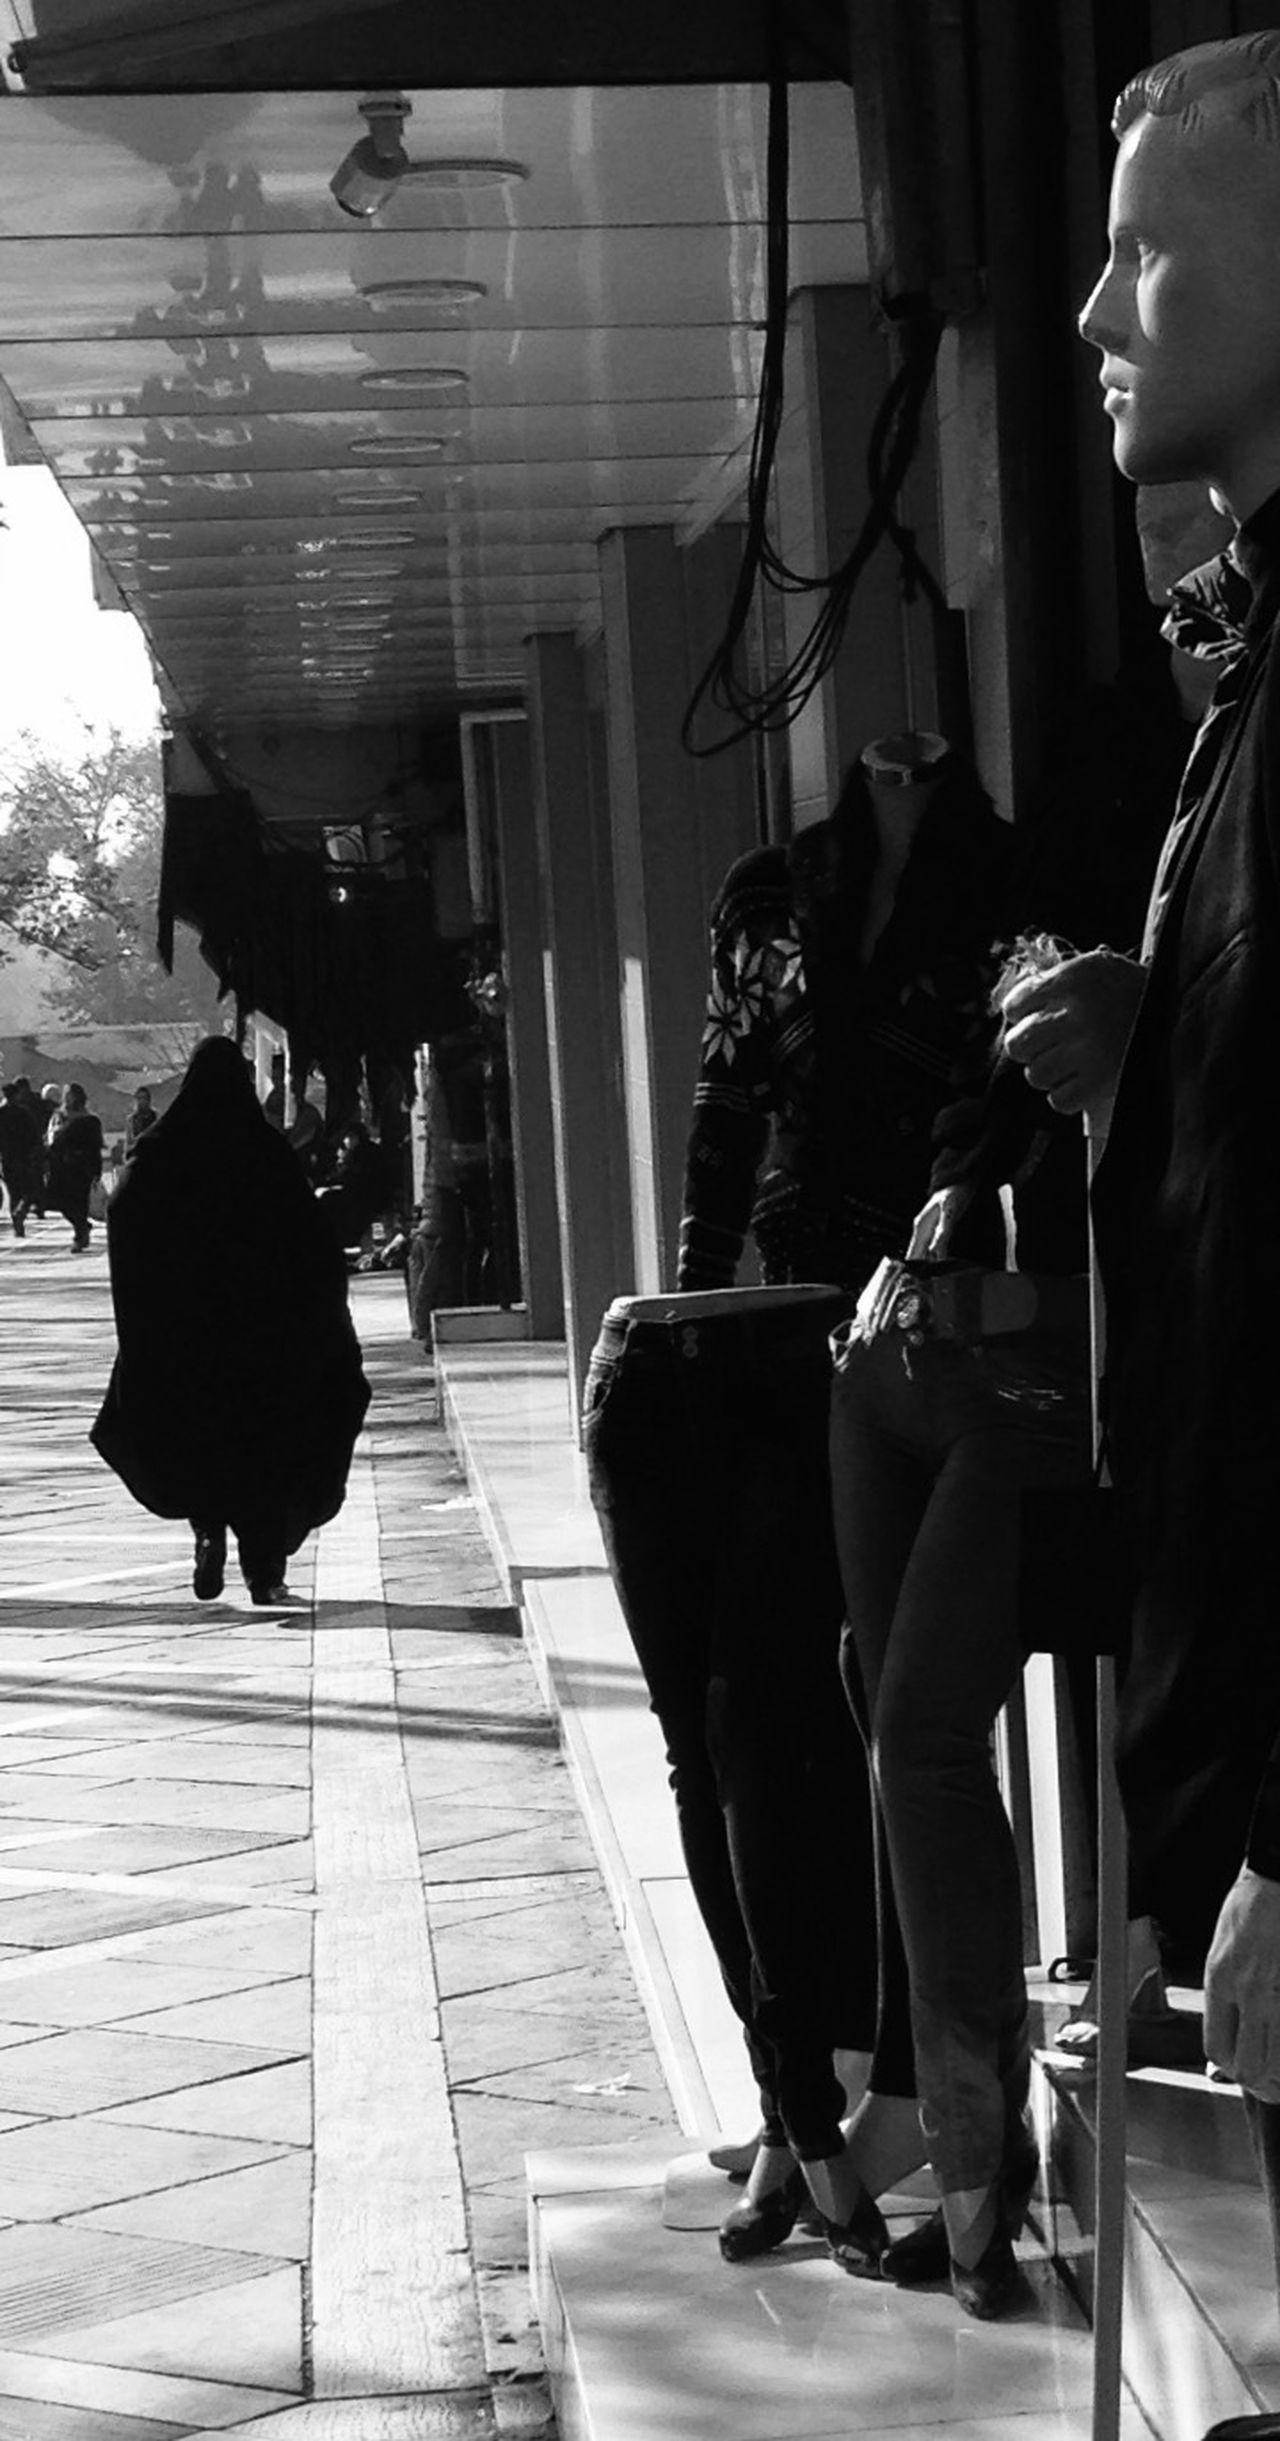 Black & White Streetphotography Immobilité Teheran EyeEm Woman Dummy